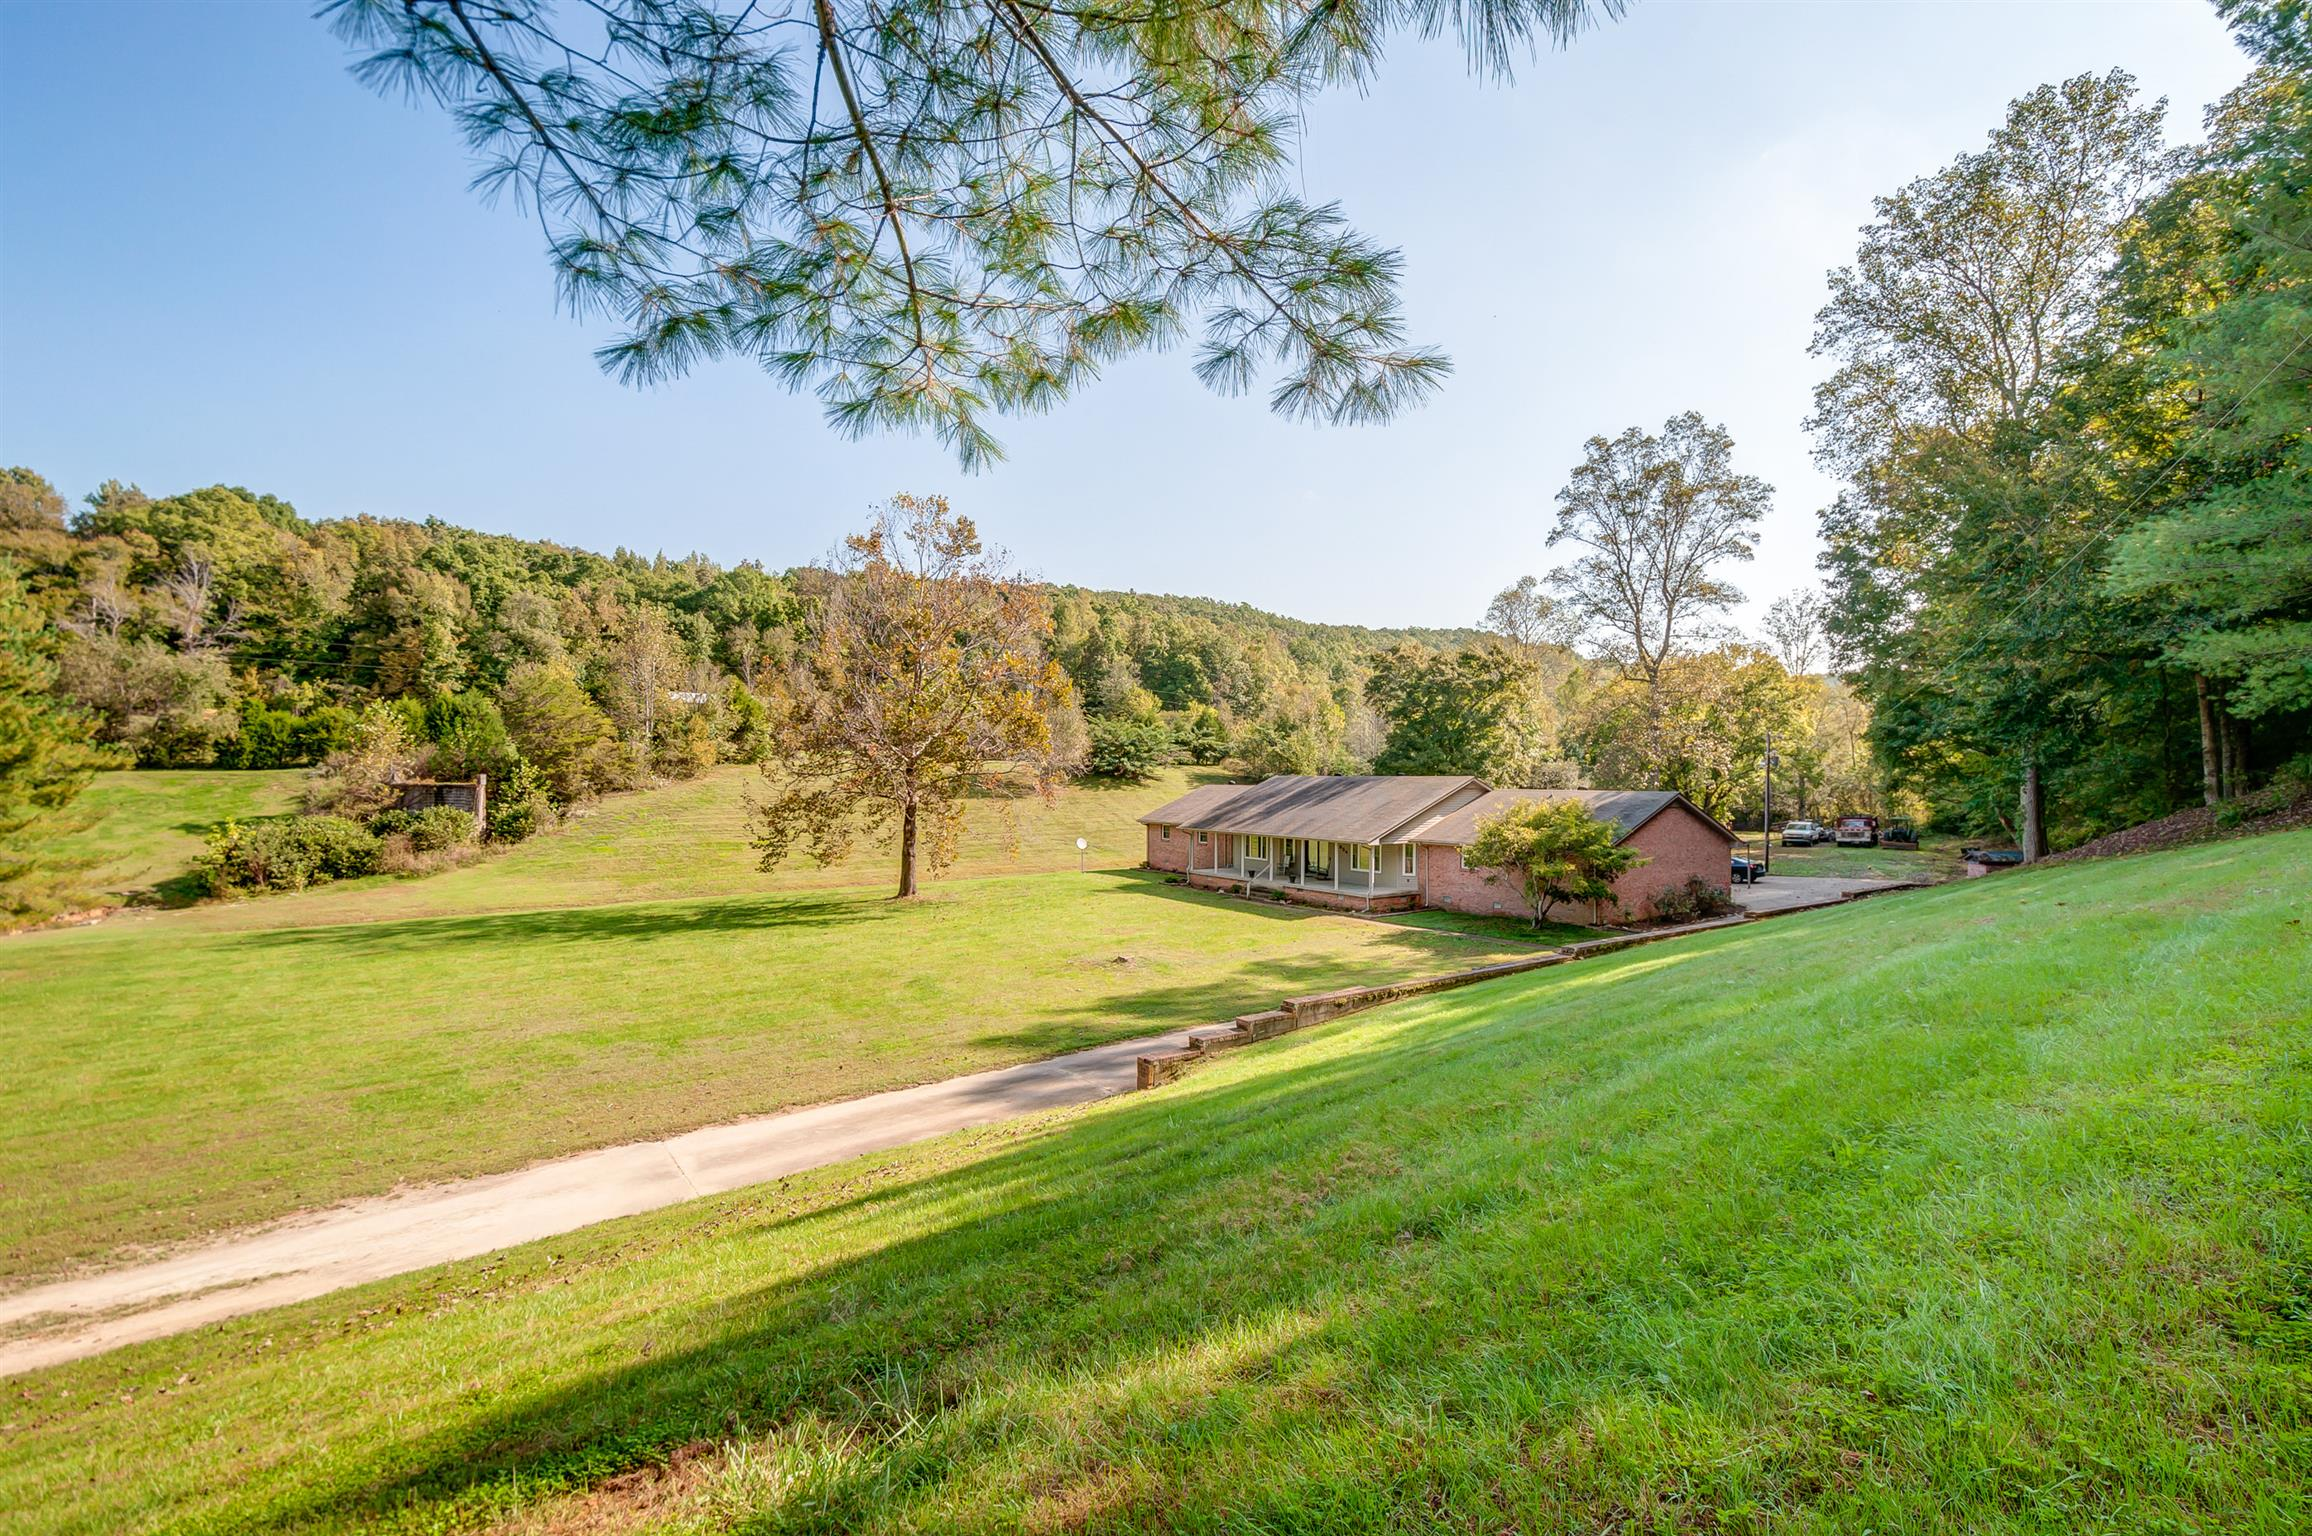 954 Prince Rd, Centerville, TN 37033 - Centerville, TN real estate listing